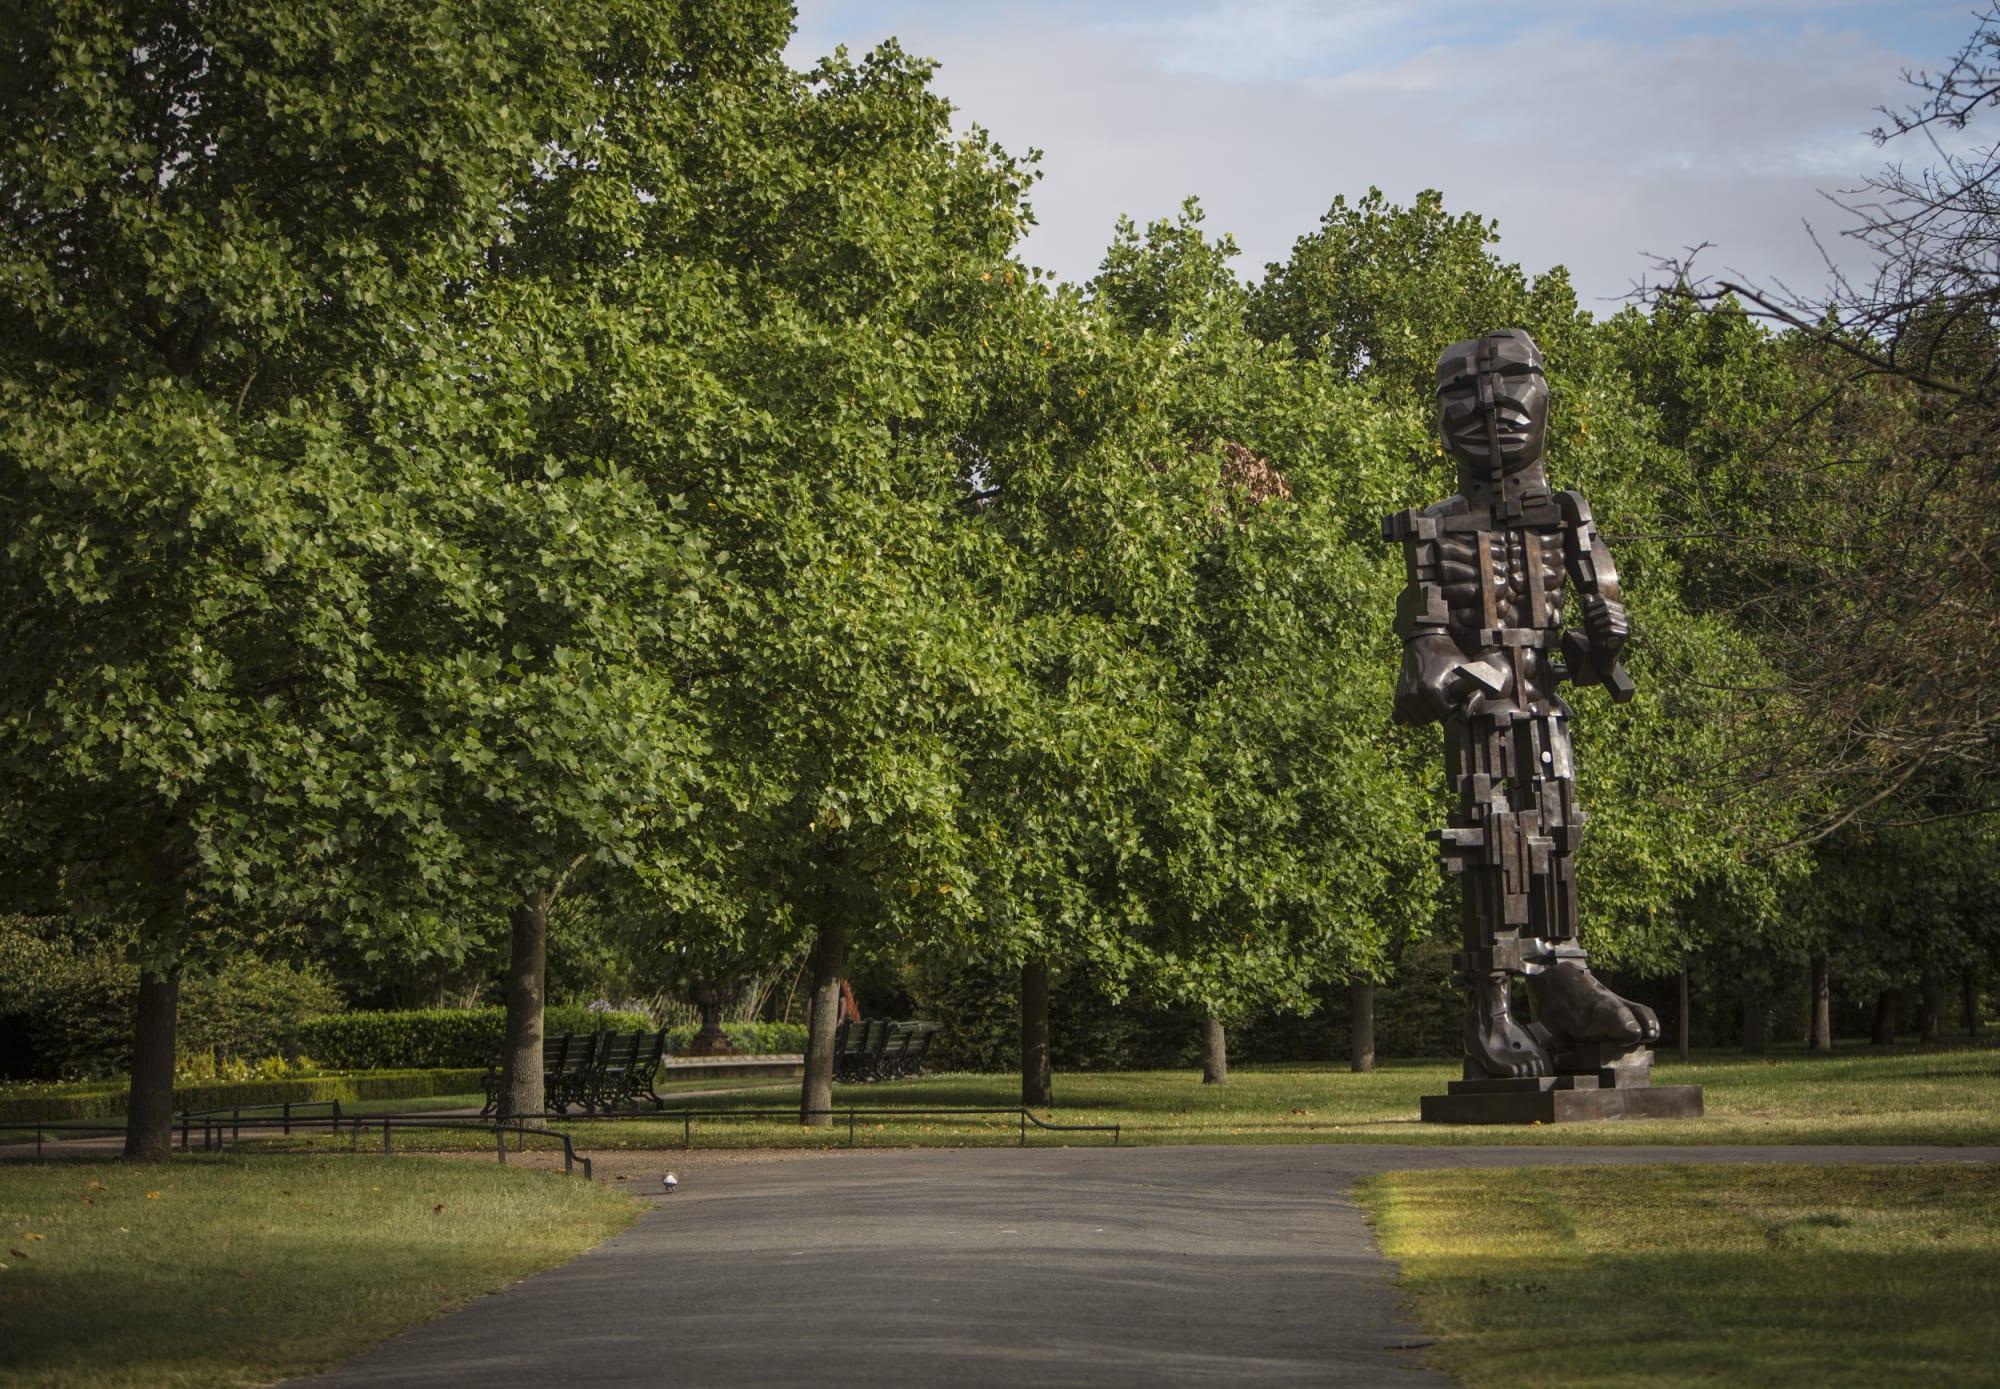 Sir Eduardo Paolozzi: His masterpiece on its way to Edinburgh